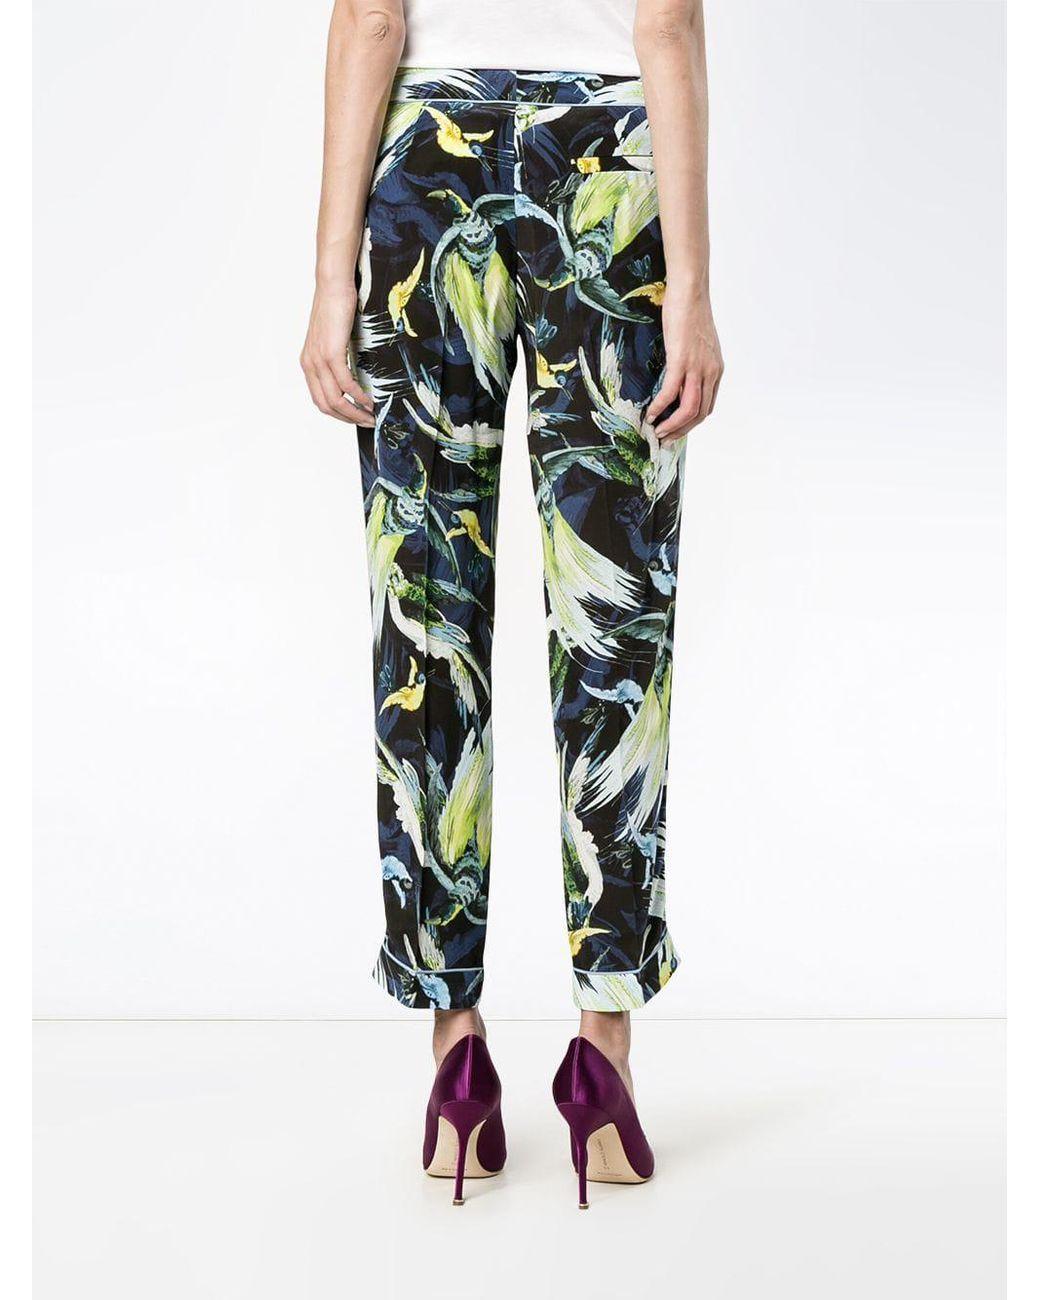 Joe Browns Womens Neon Tropical Bird Print Sarong Multicoloured One Size